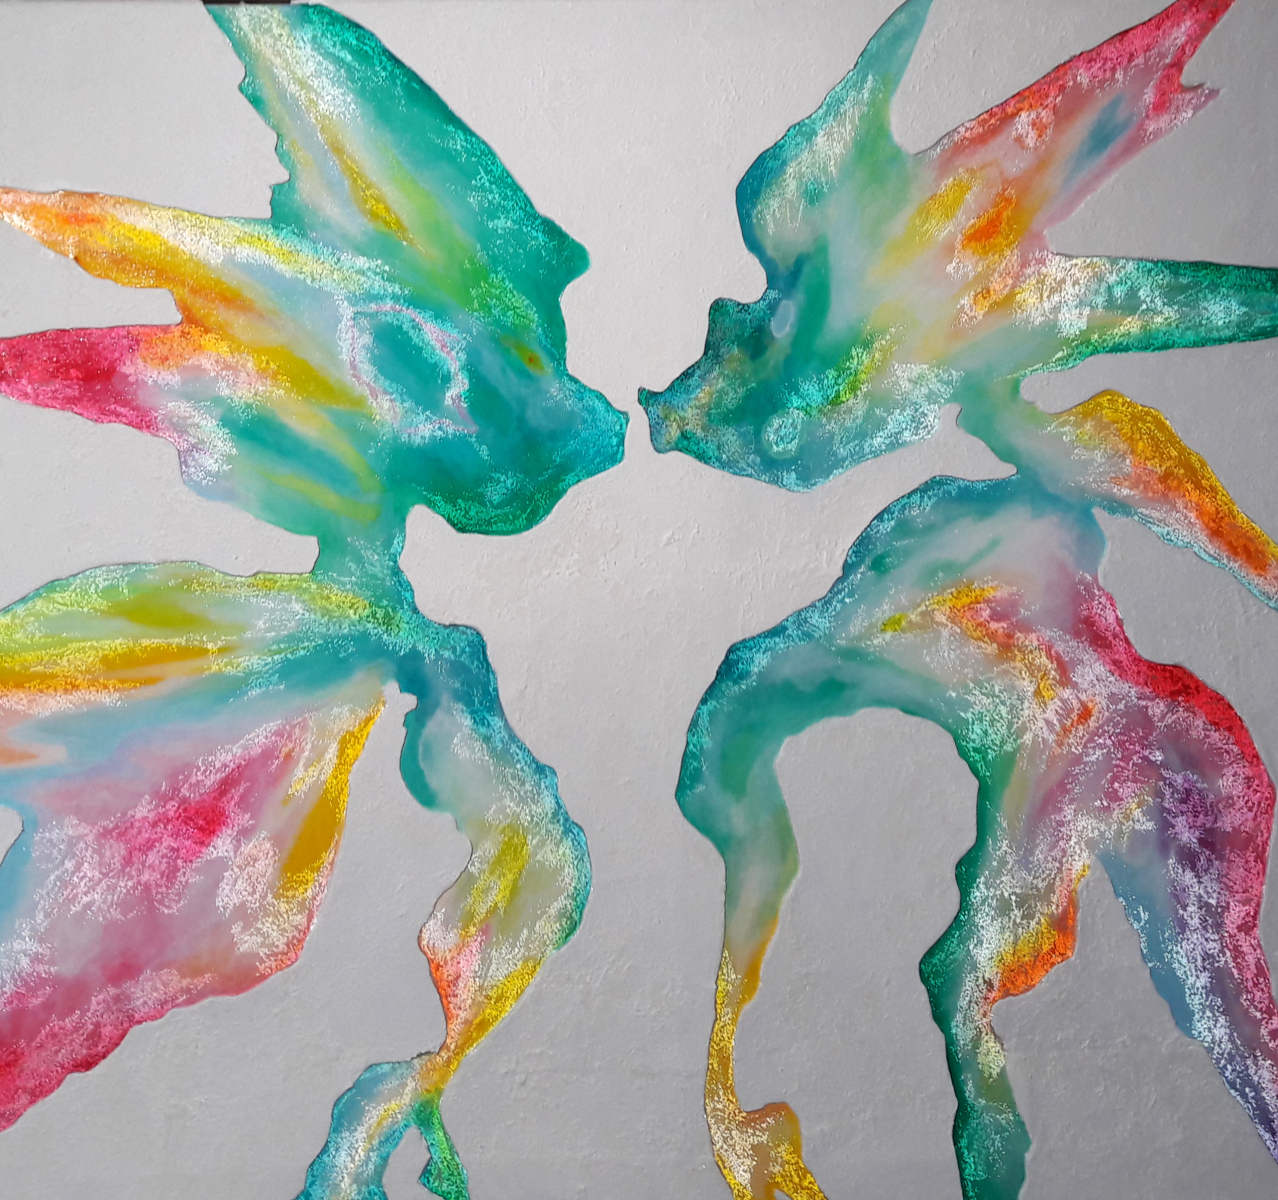 165_2019_Kissing-Colours_131x151